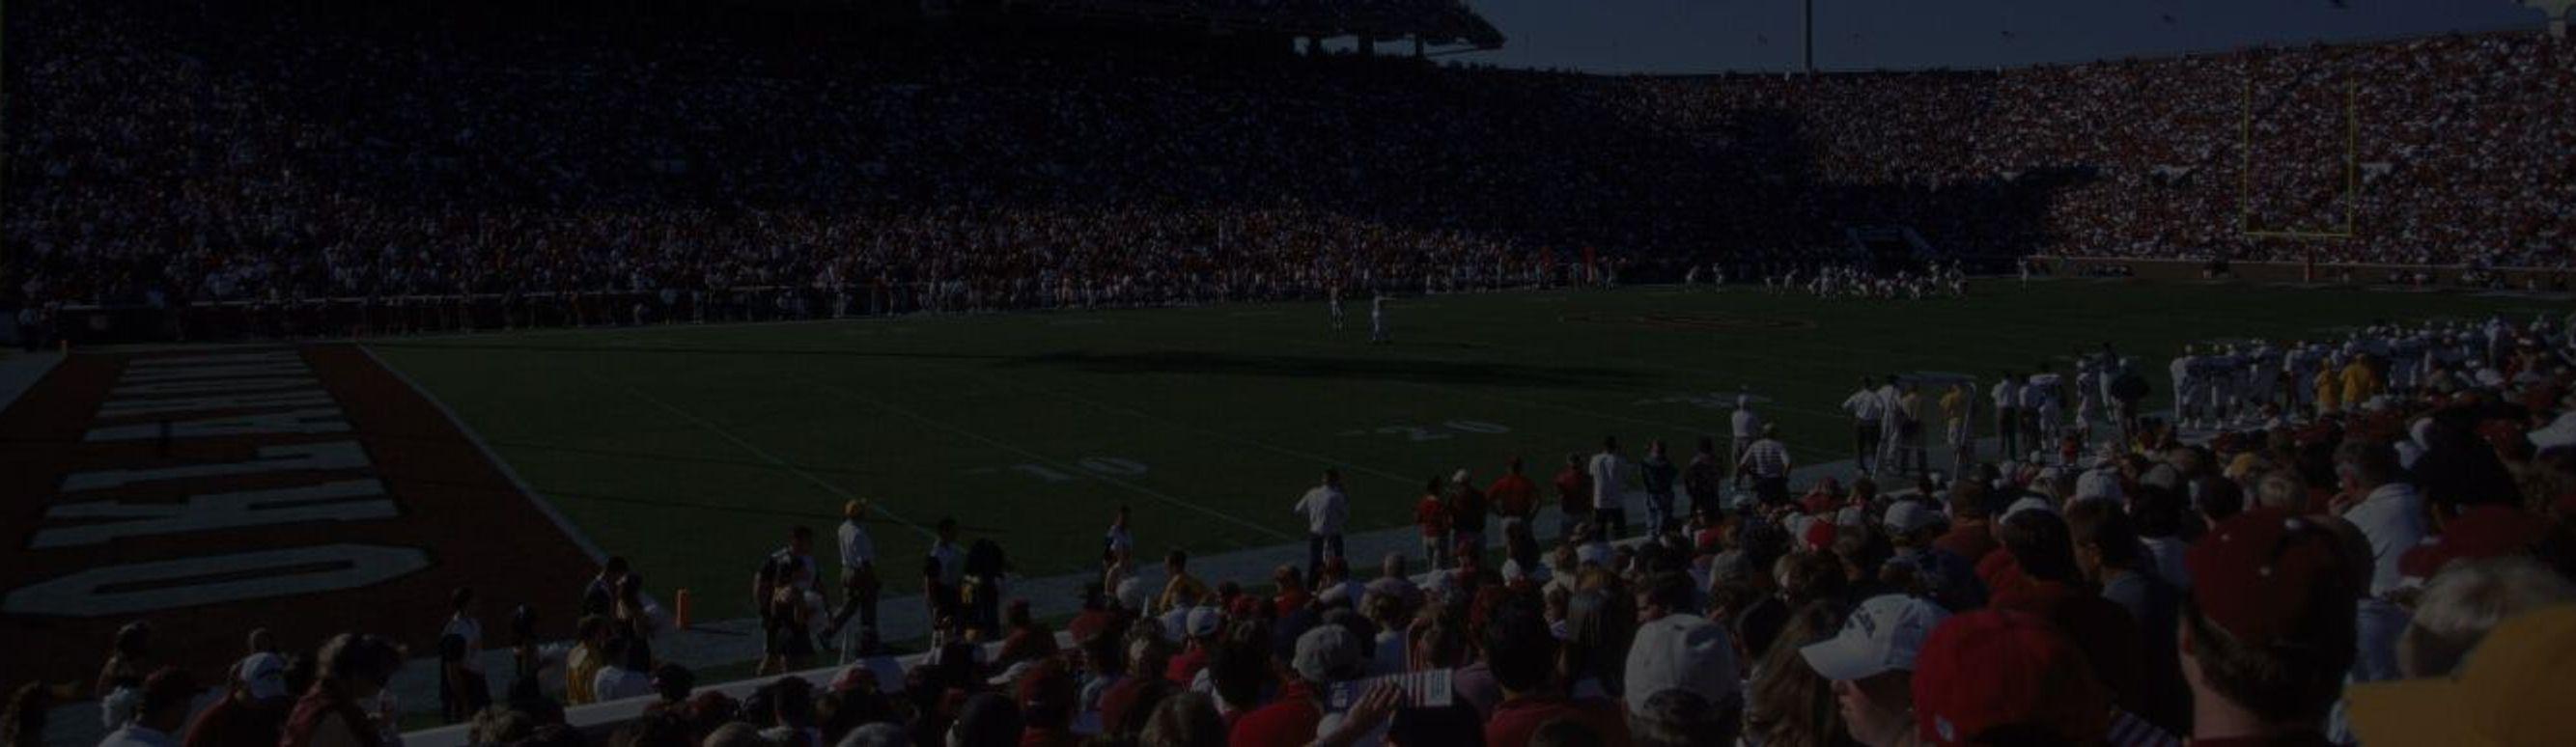 Oklahoma Memorial Stadium in Norman, Oklahoma